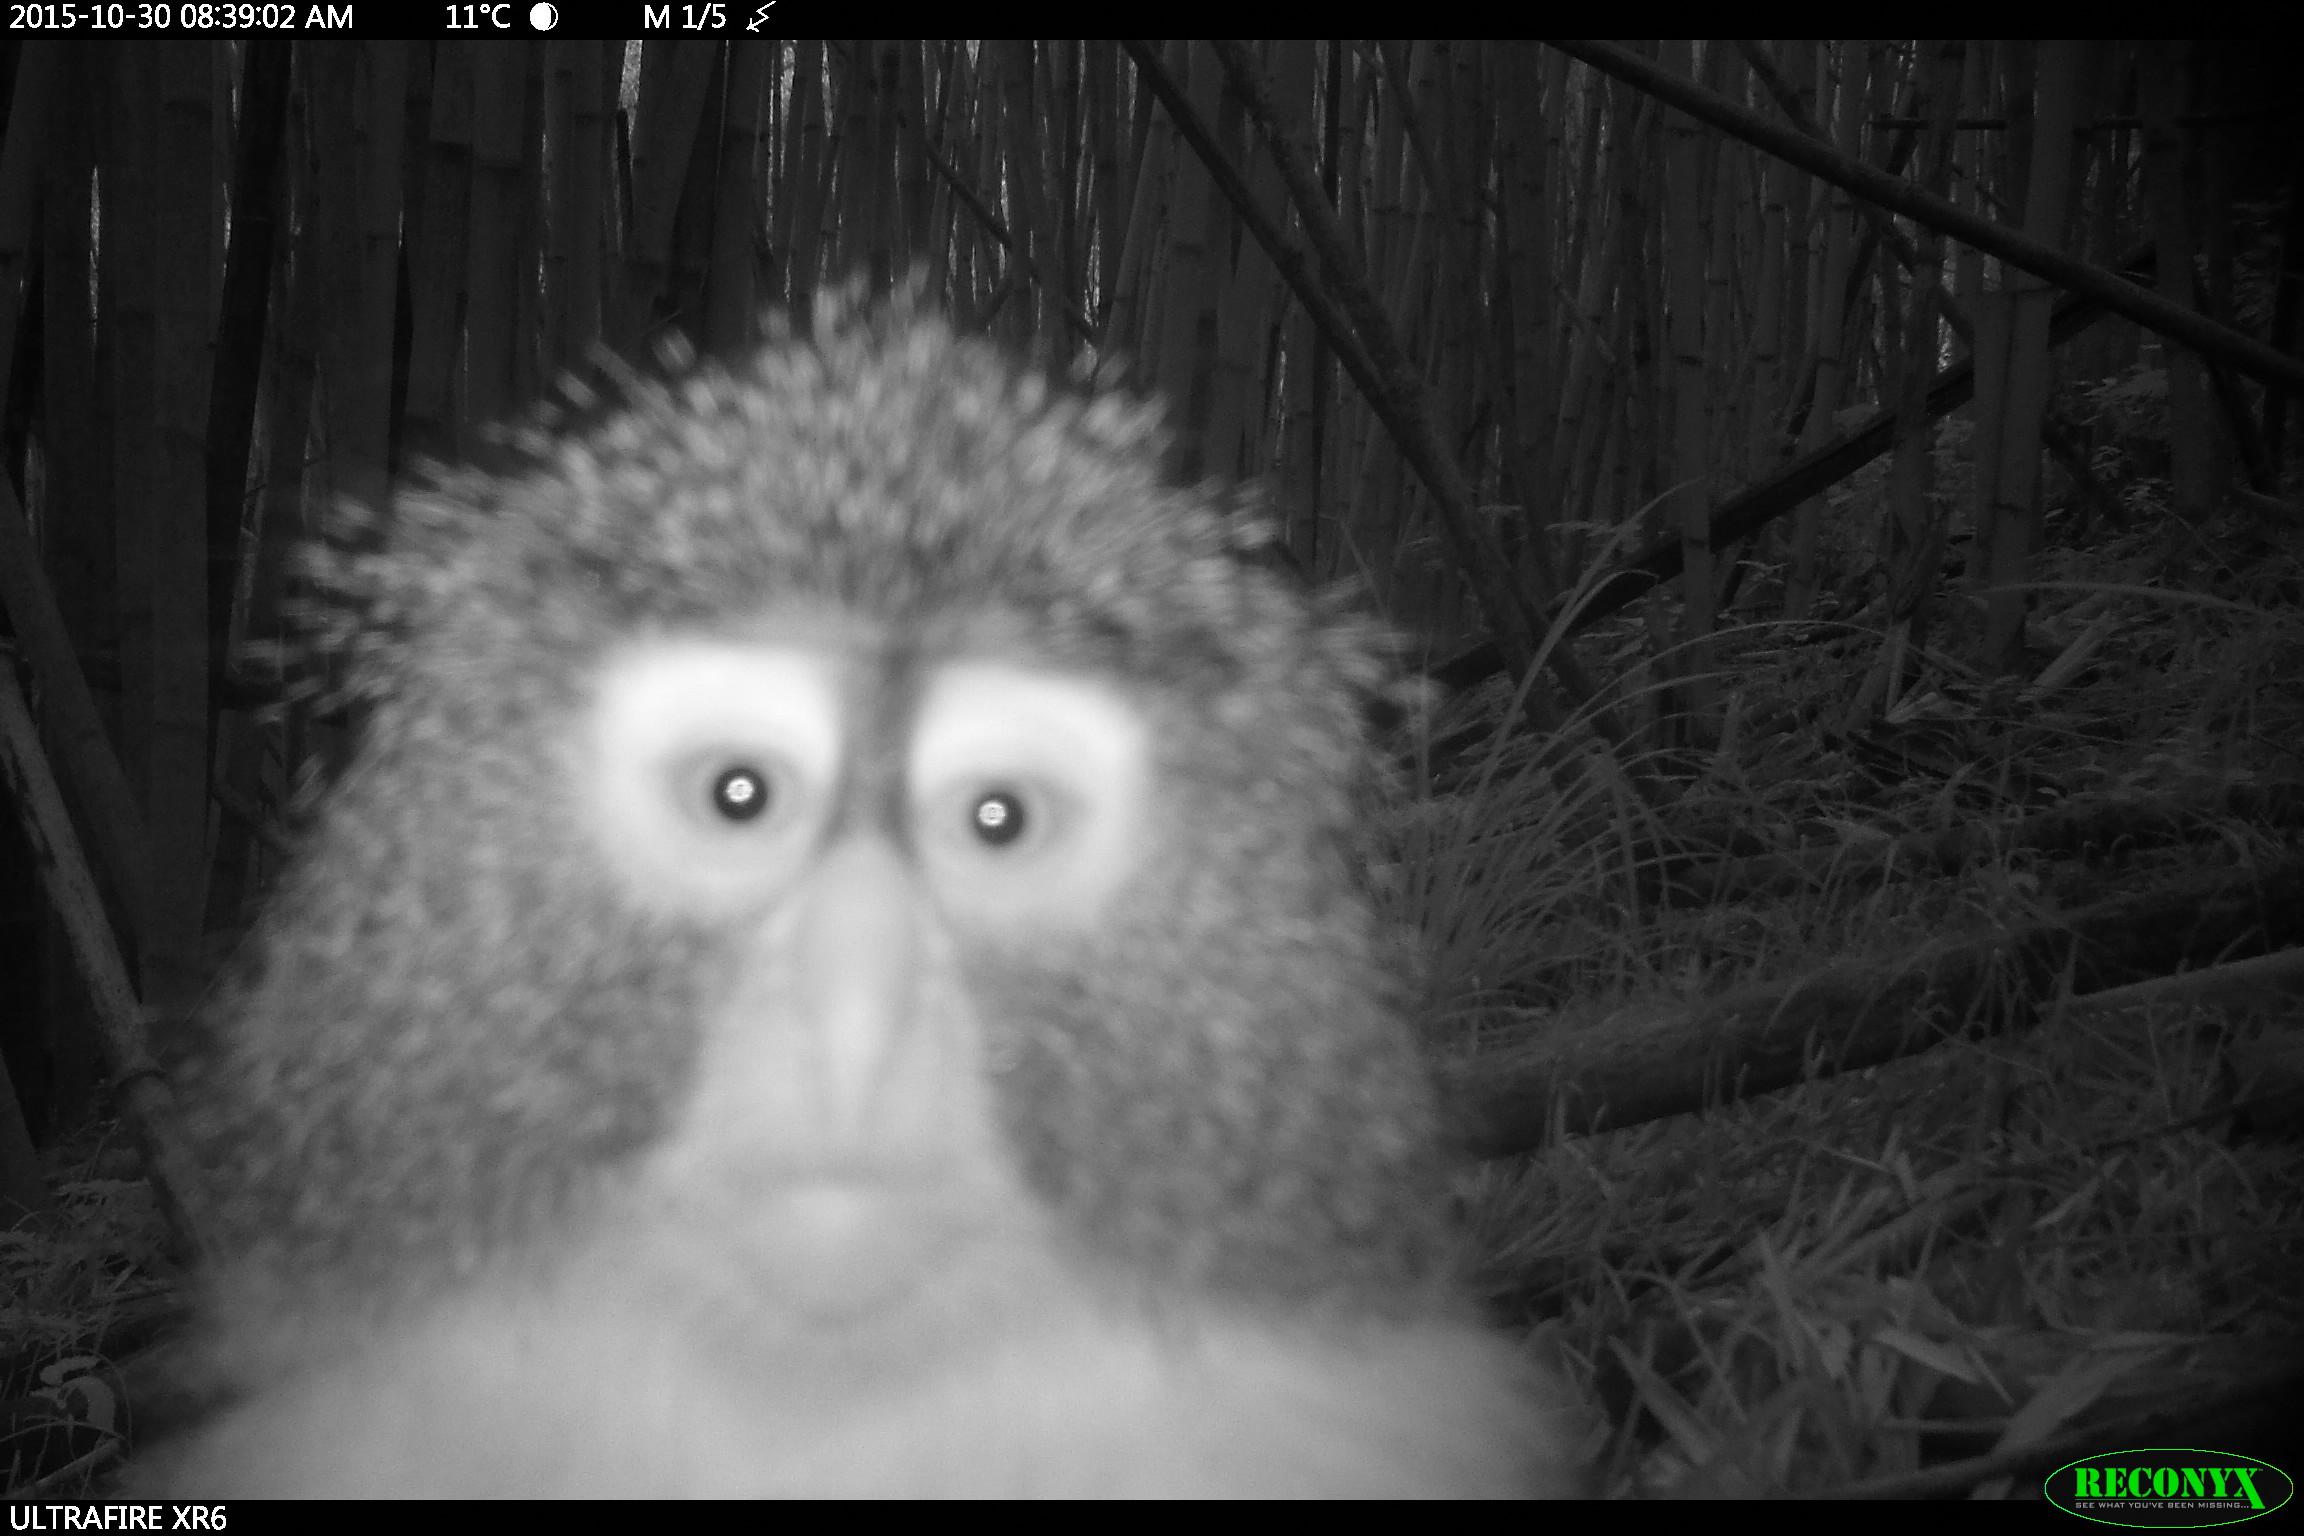 Blue Monkey – A Monkey that Looks Like an Owl